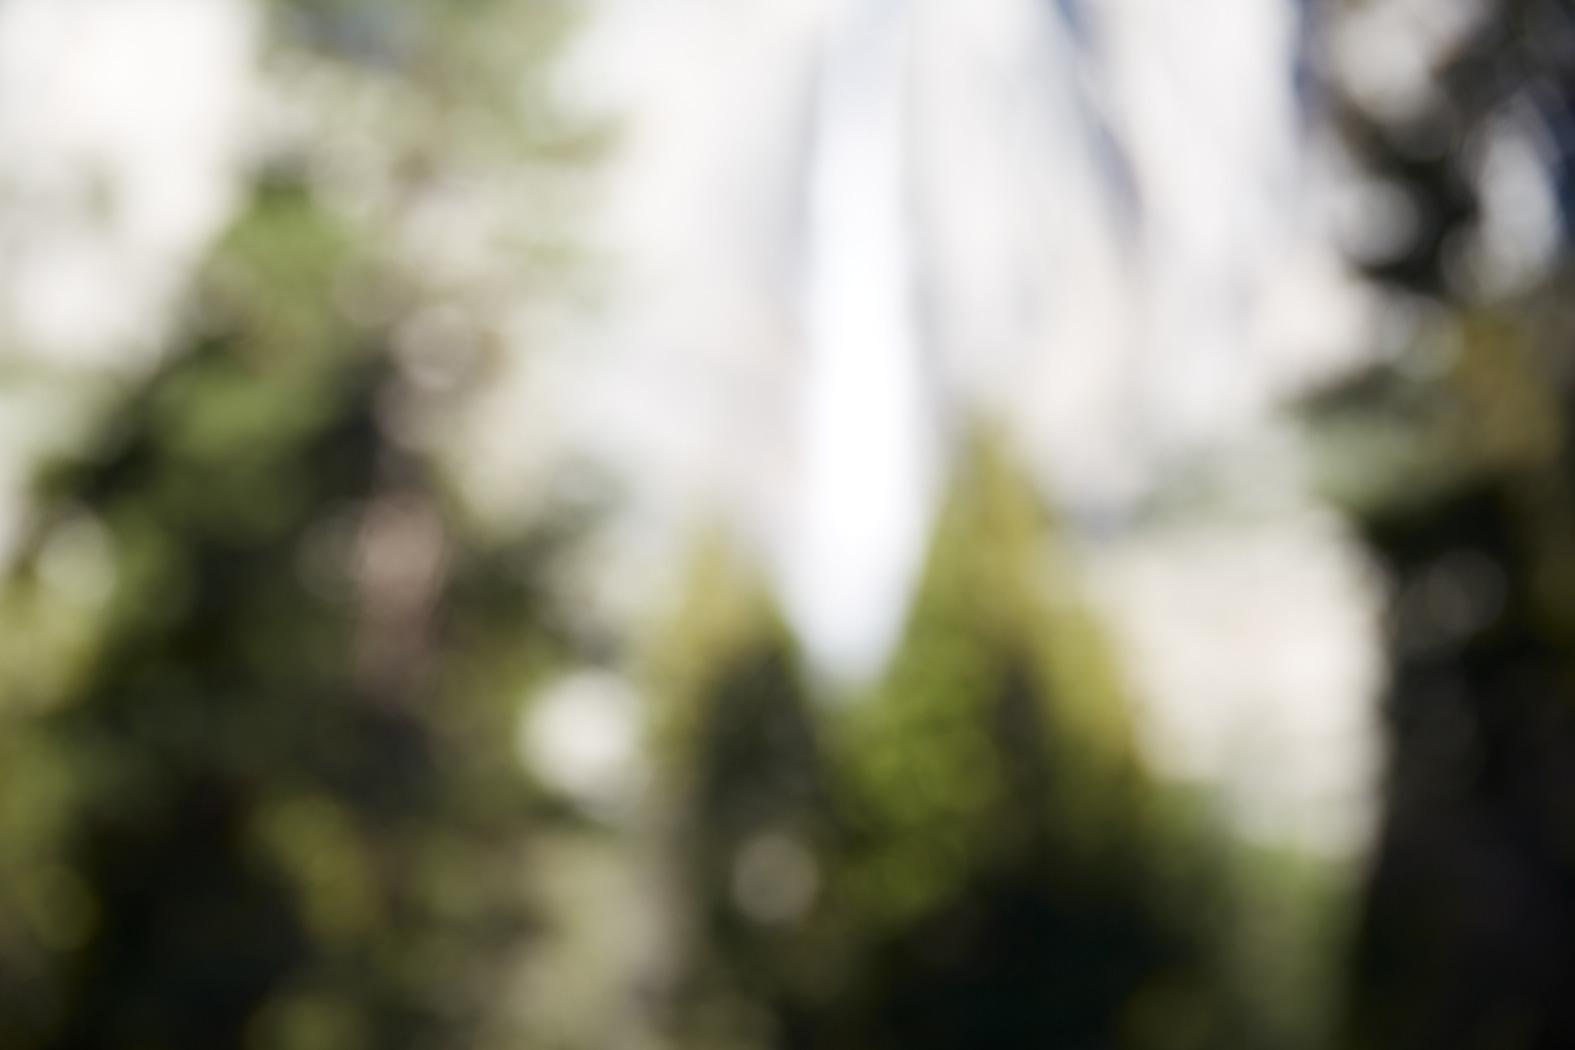 CATHERINE OPIE, Untitled #3 (Yosemite Valley), 2015